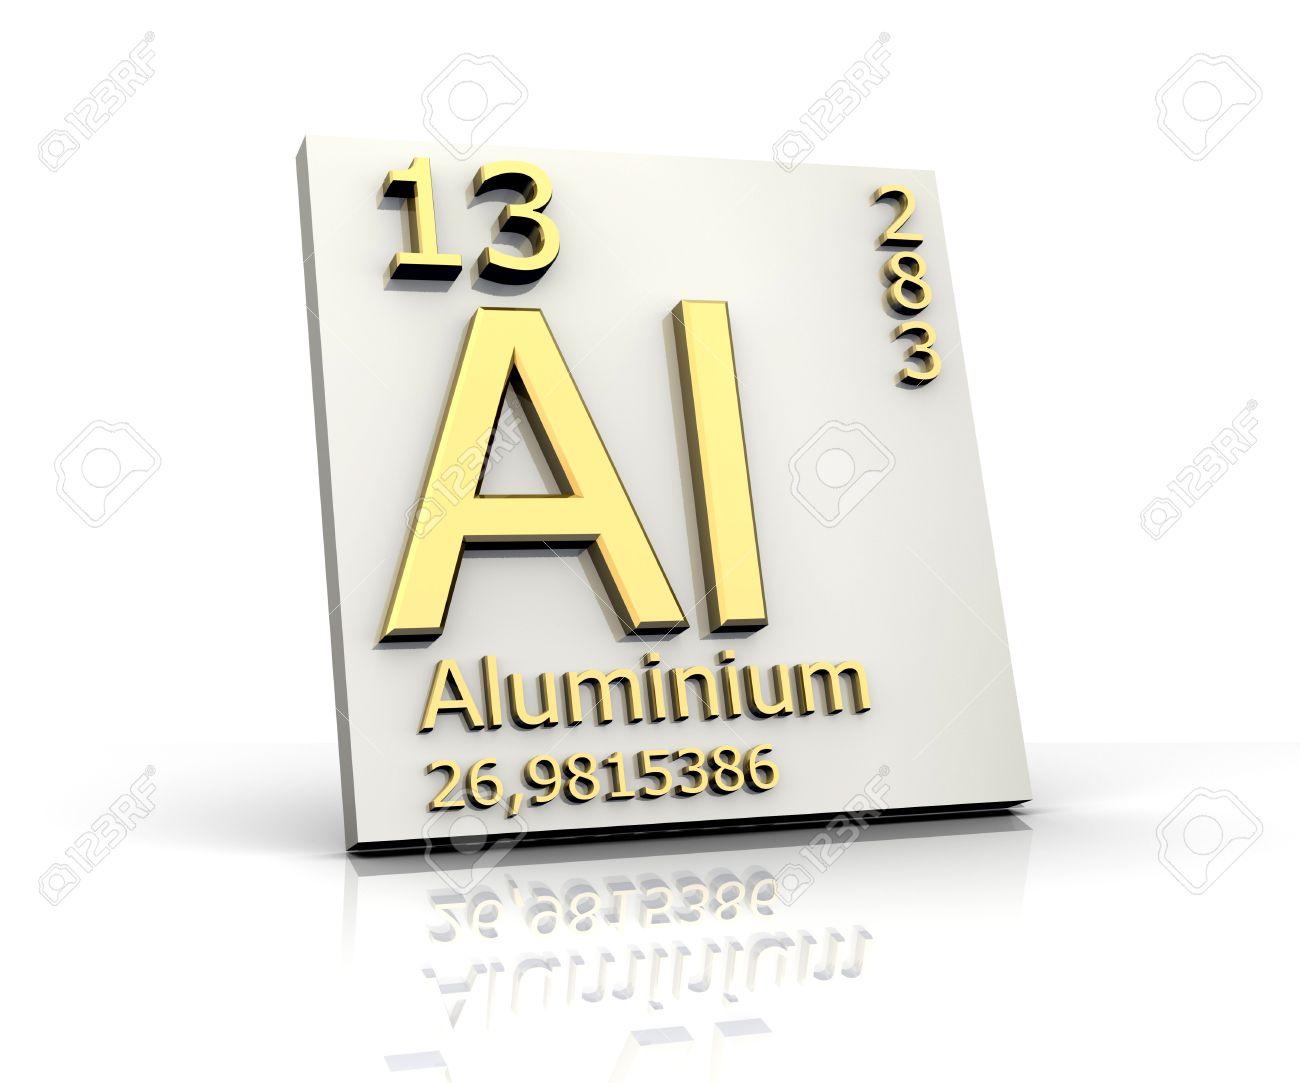 Unq periodic table images periodic table images aluminum periodic table choice image periodic table images aluminum form periodic table of elements stock photo gamestrikefo Images